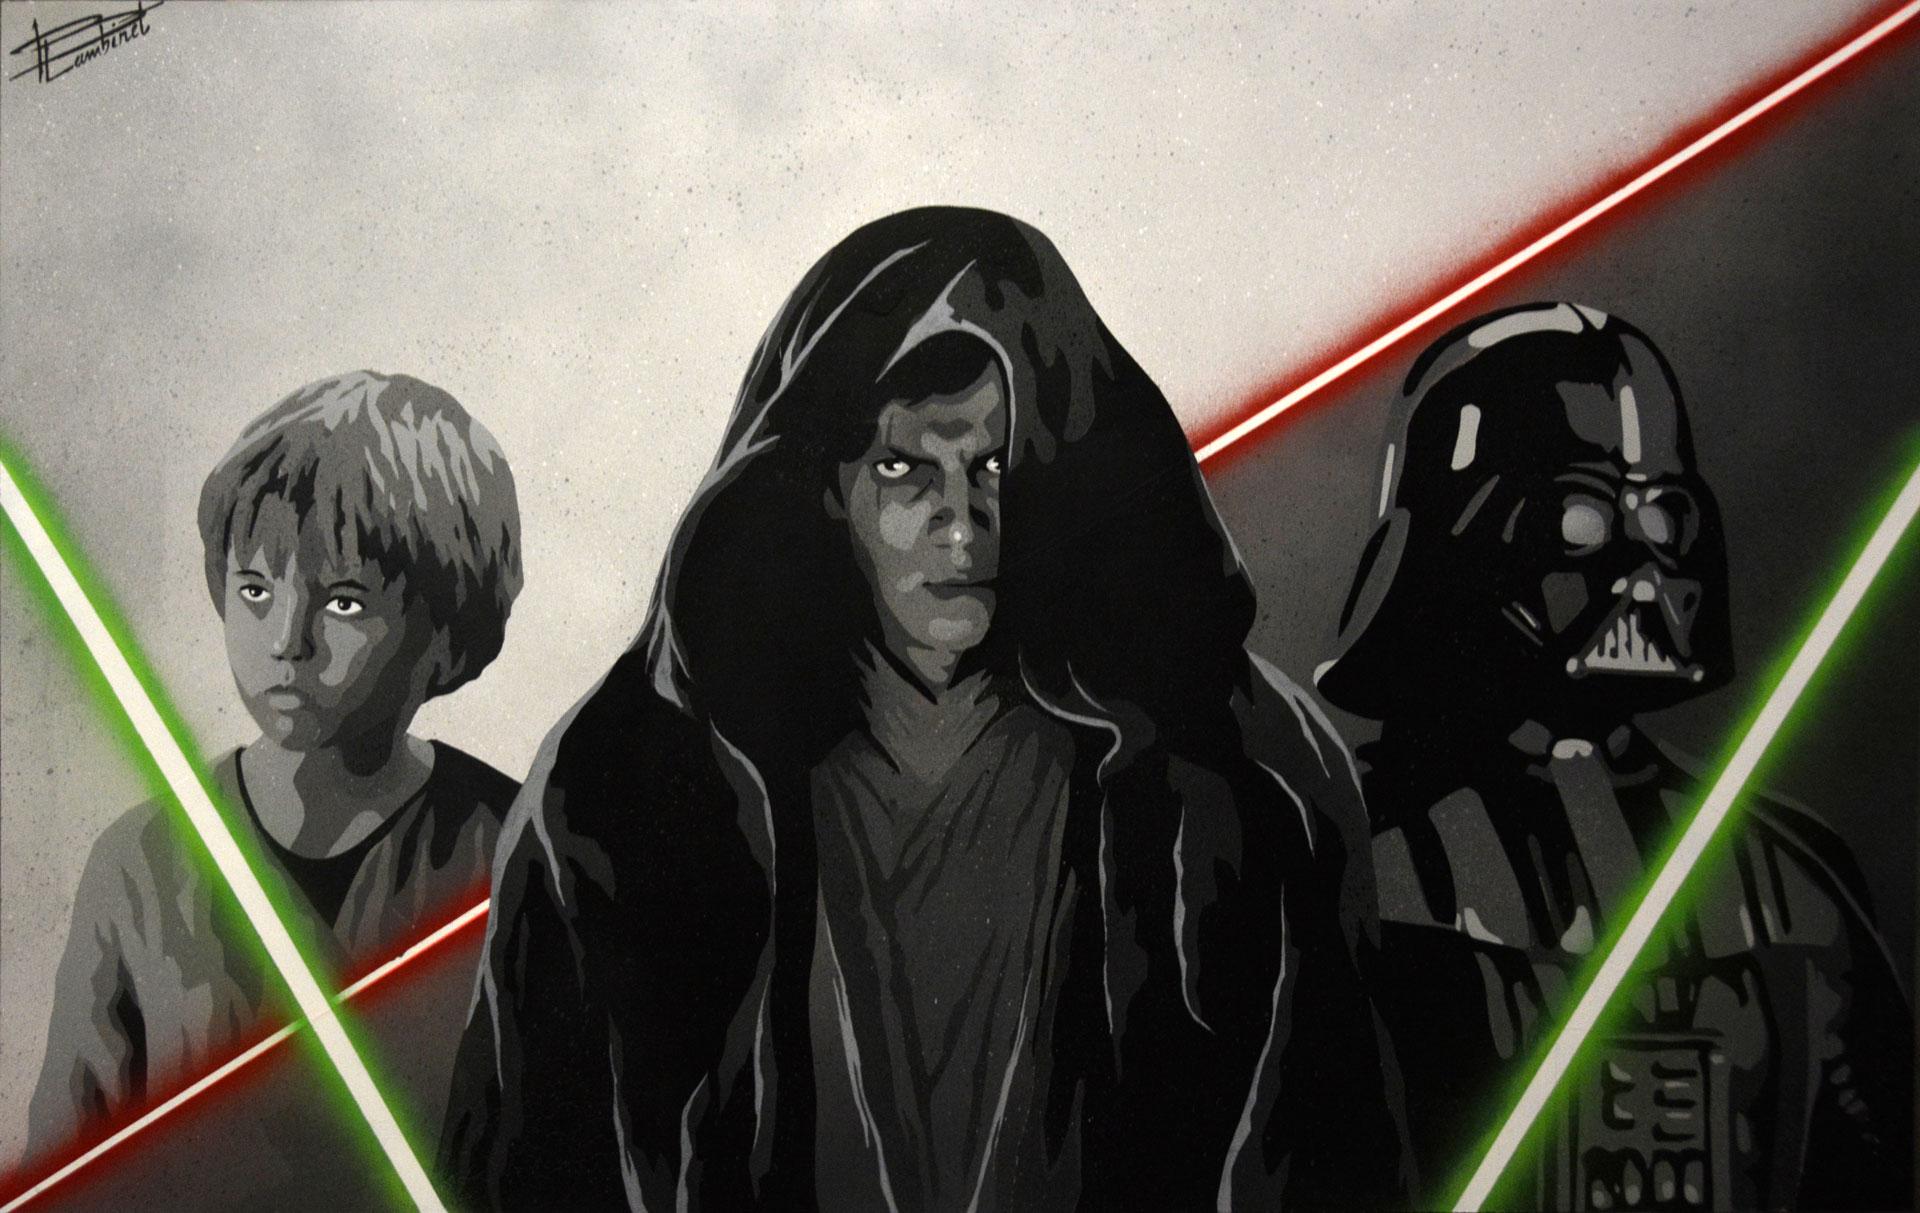 Peinture de Star Wars complète